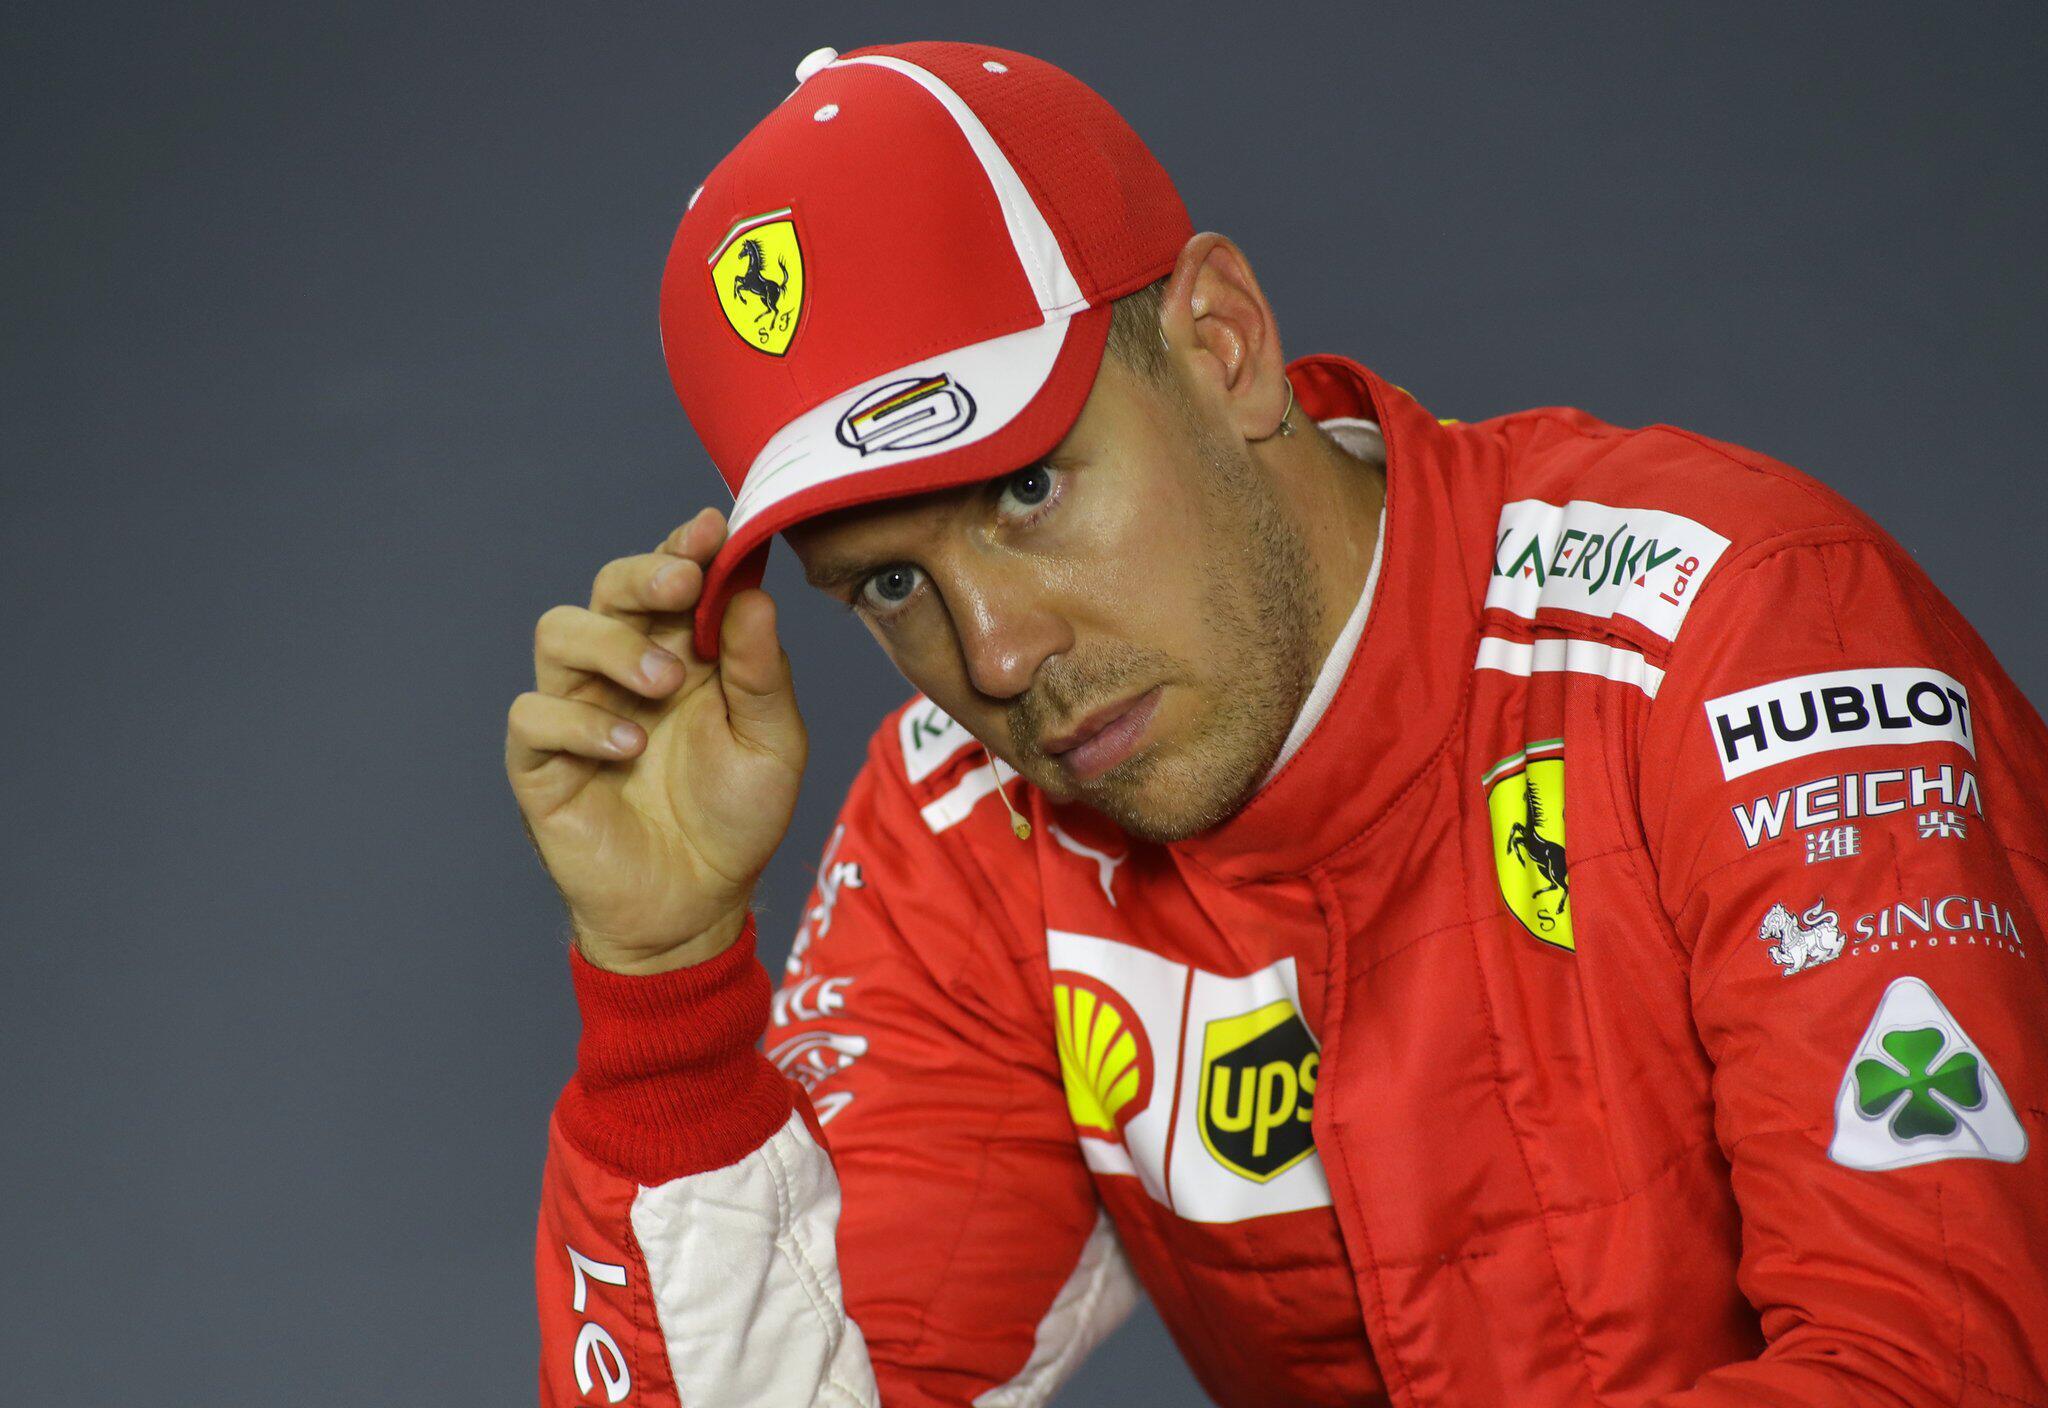 Bild zu Russland Formel 1 - Grand Prix